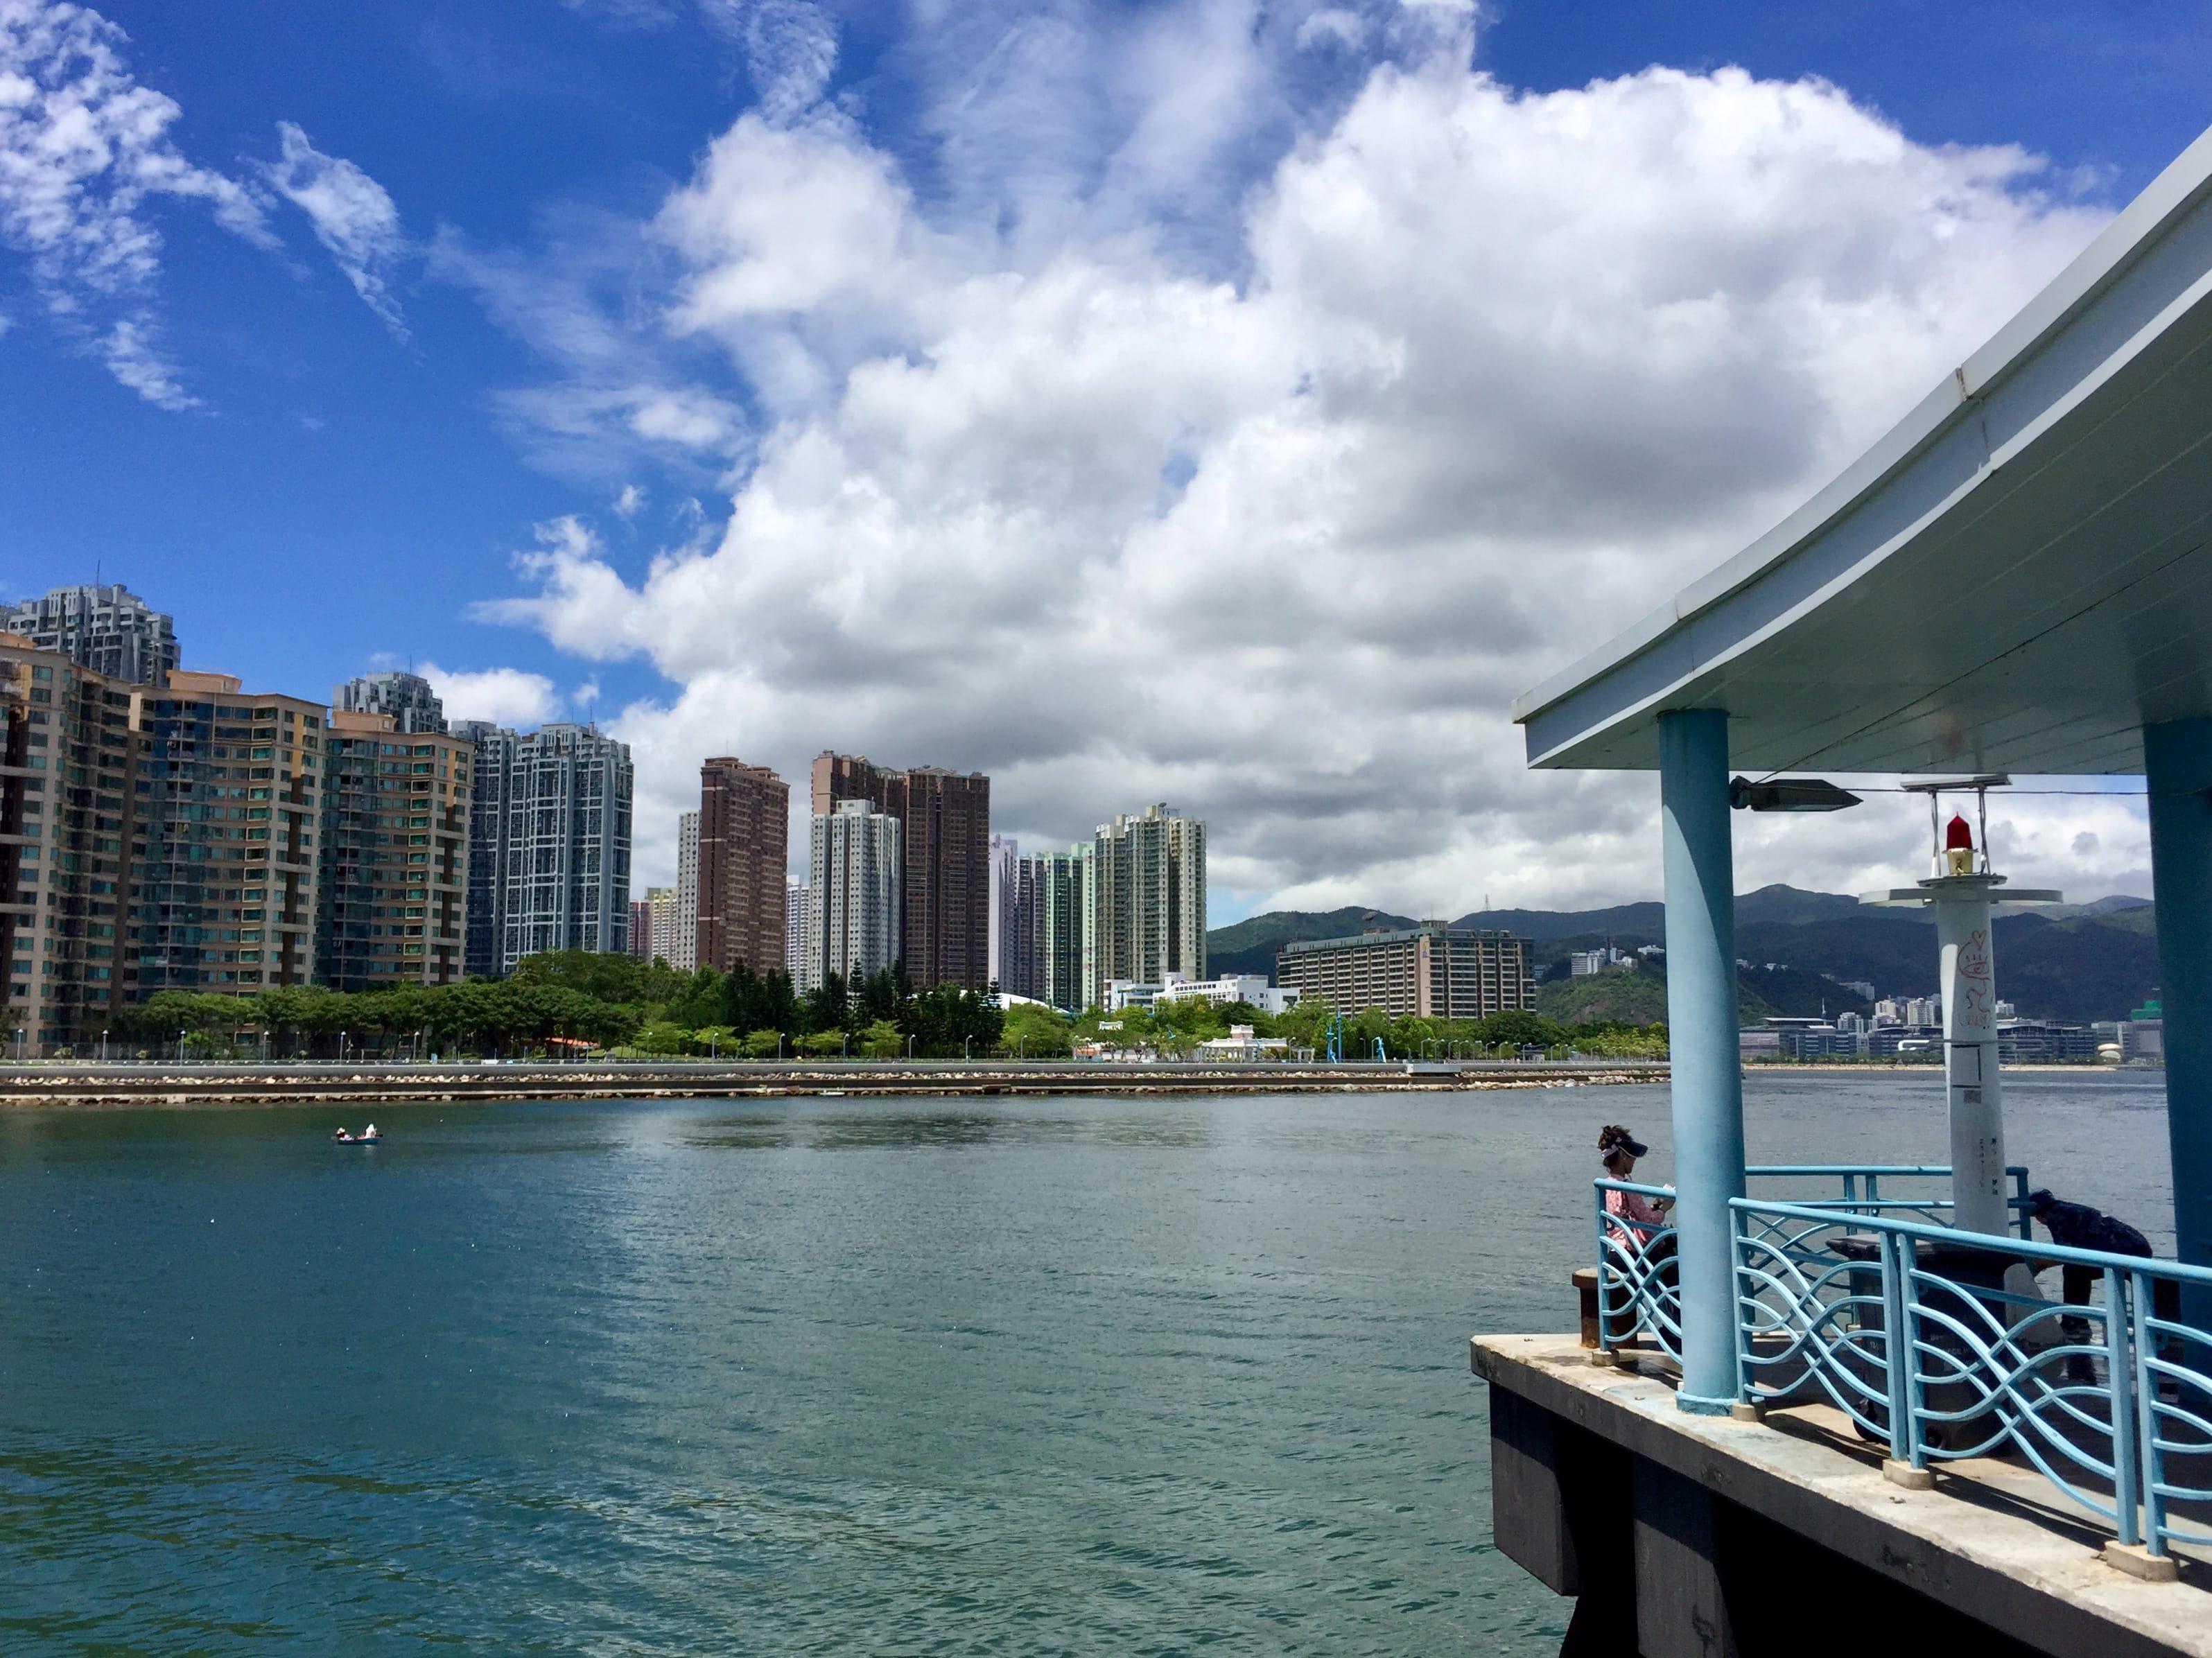 Ma On Shan Promenade looking from the Wu Kai Sha Pier